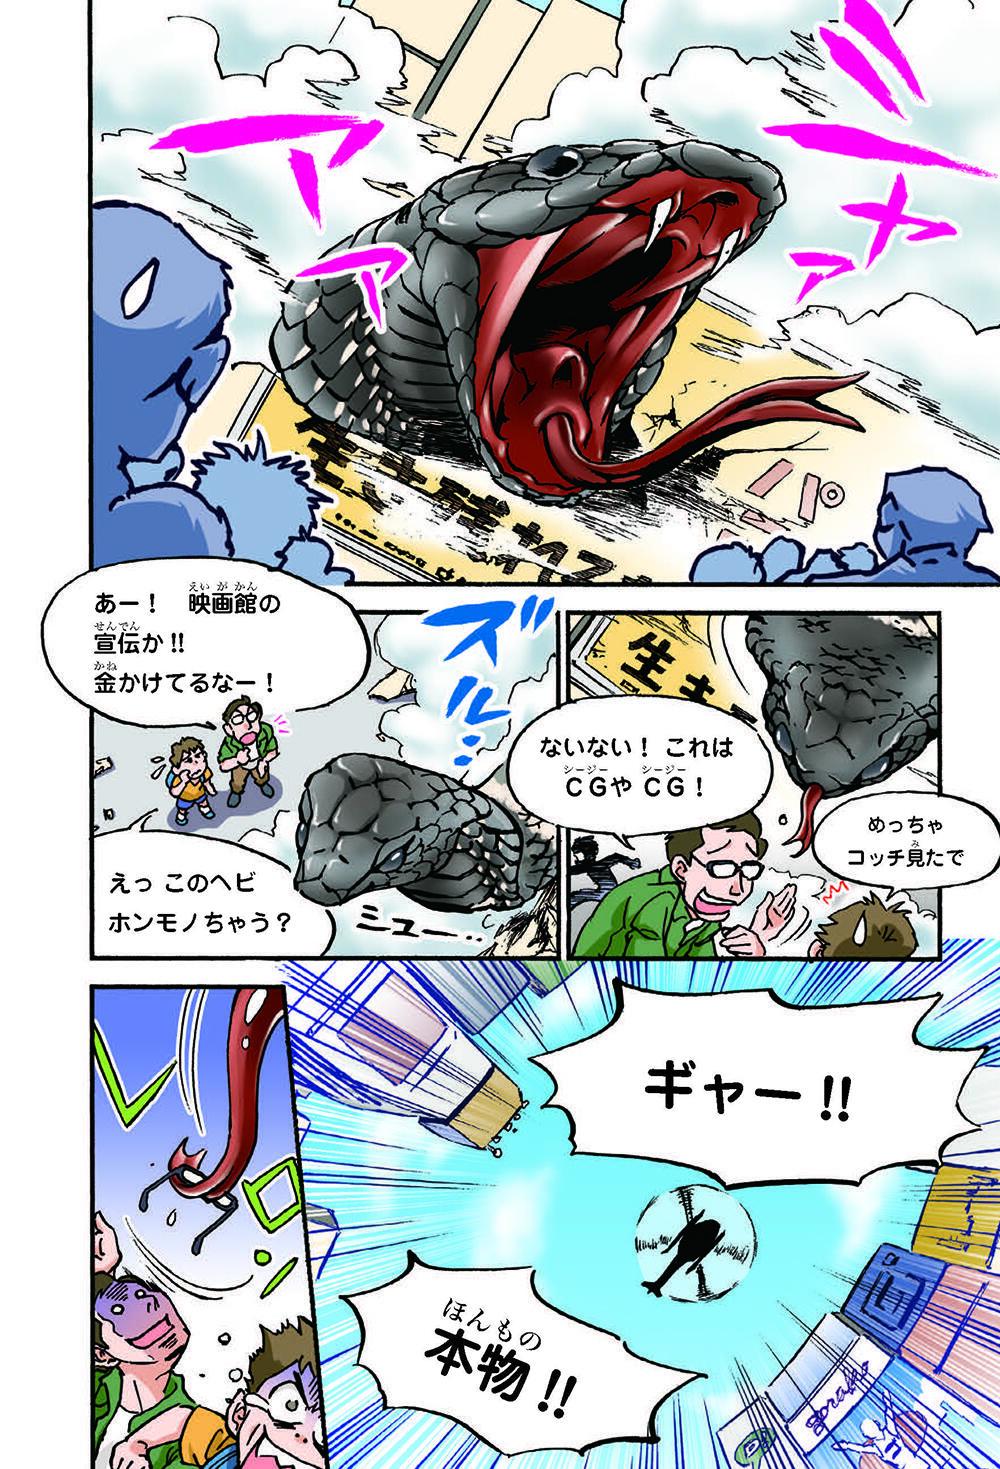 BB_蜊ア髯コ逕溽黄_繝倥z繝シ繧キ繧兩011.jpg